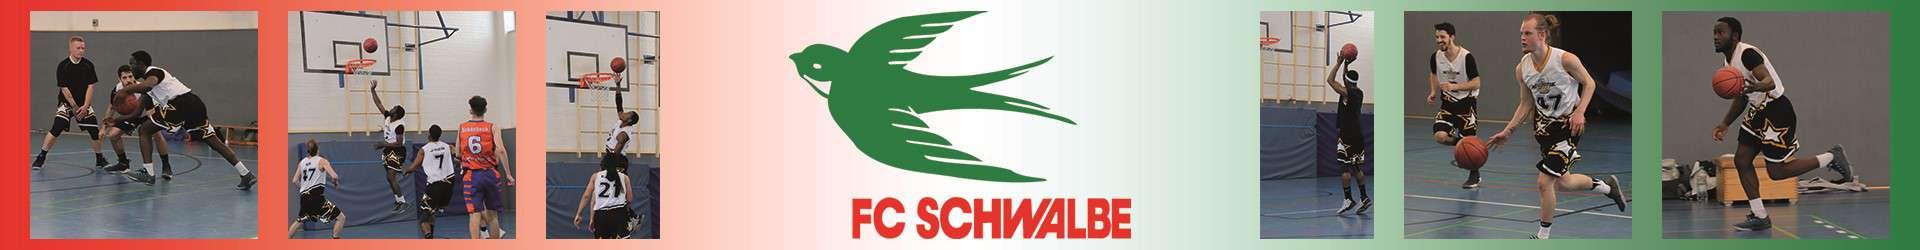 Basketball FC Schwalbe Hannover